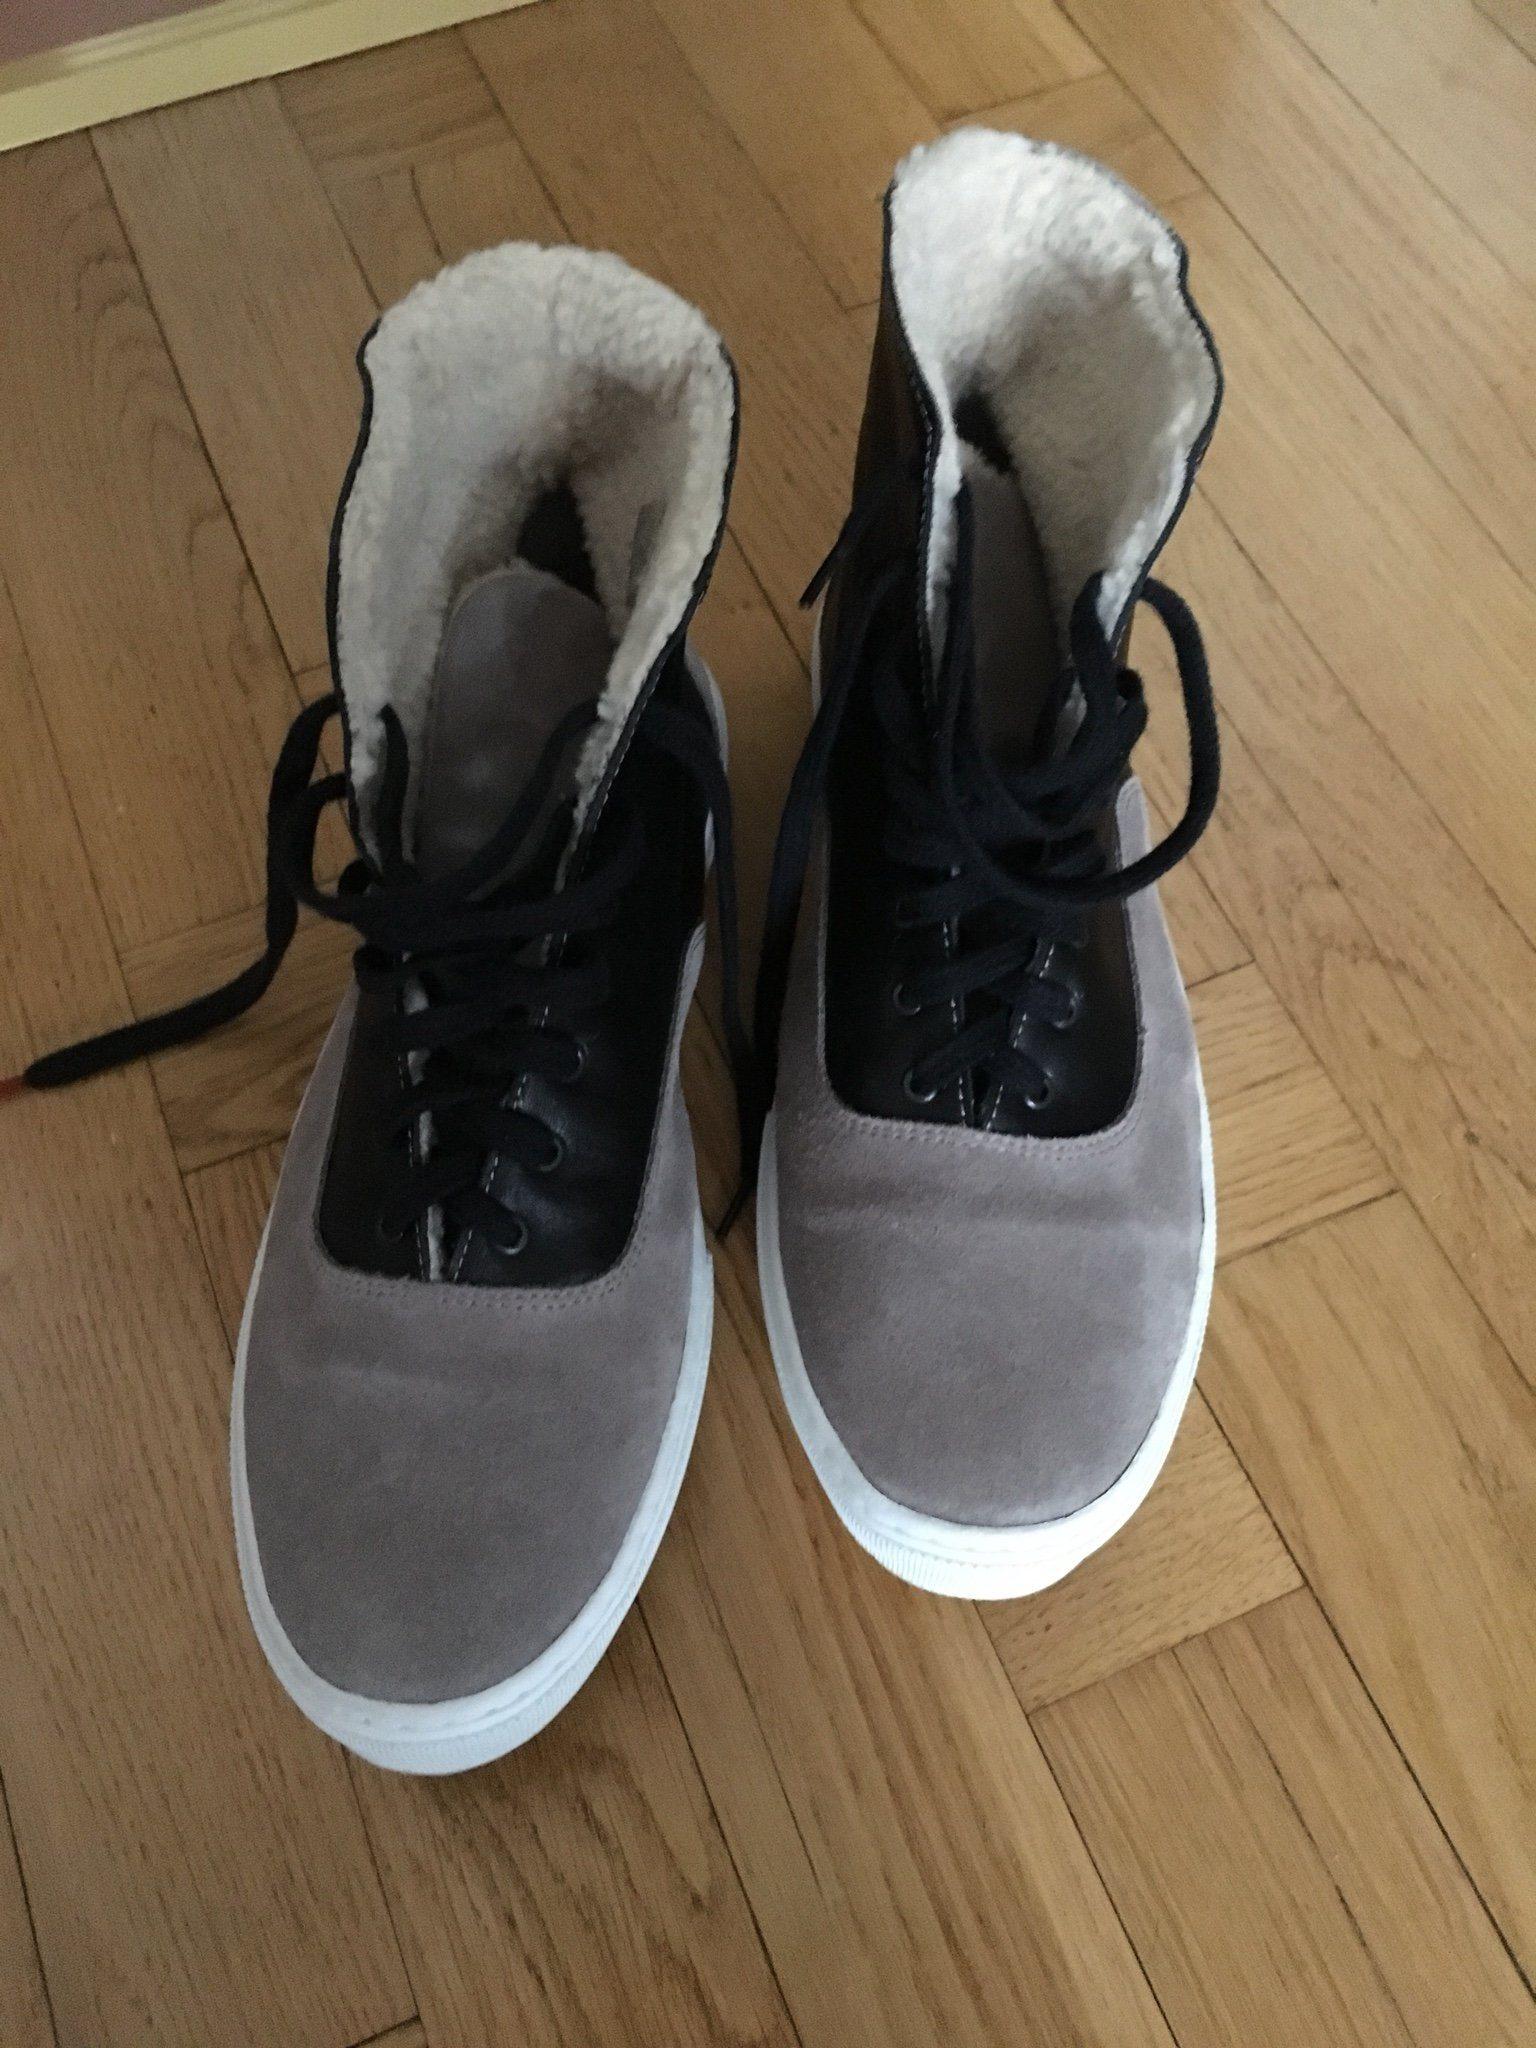 Sneakers Prins strl.4344 29 cm (355641809) ᐈ Köp på Tradera